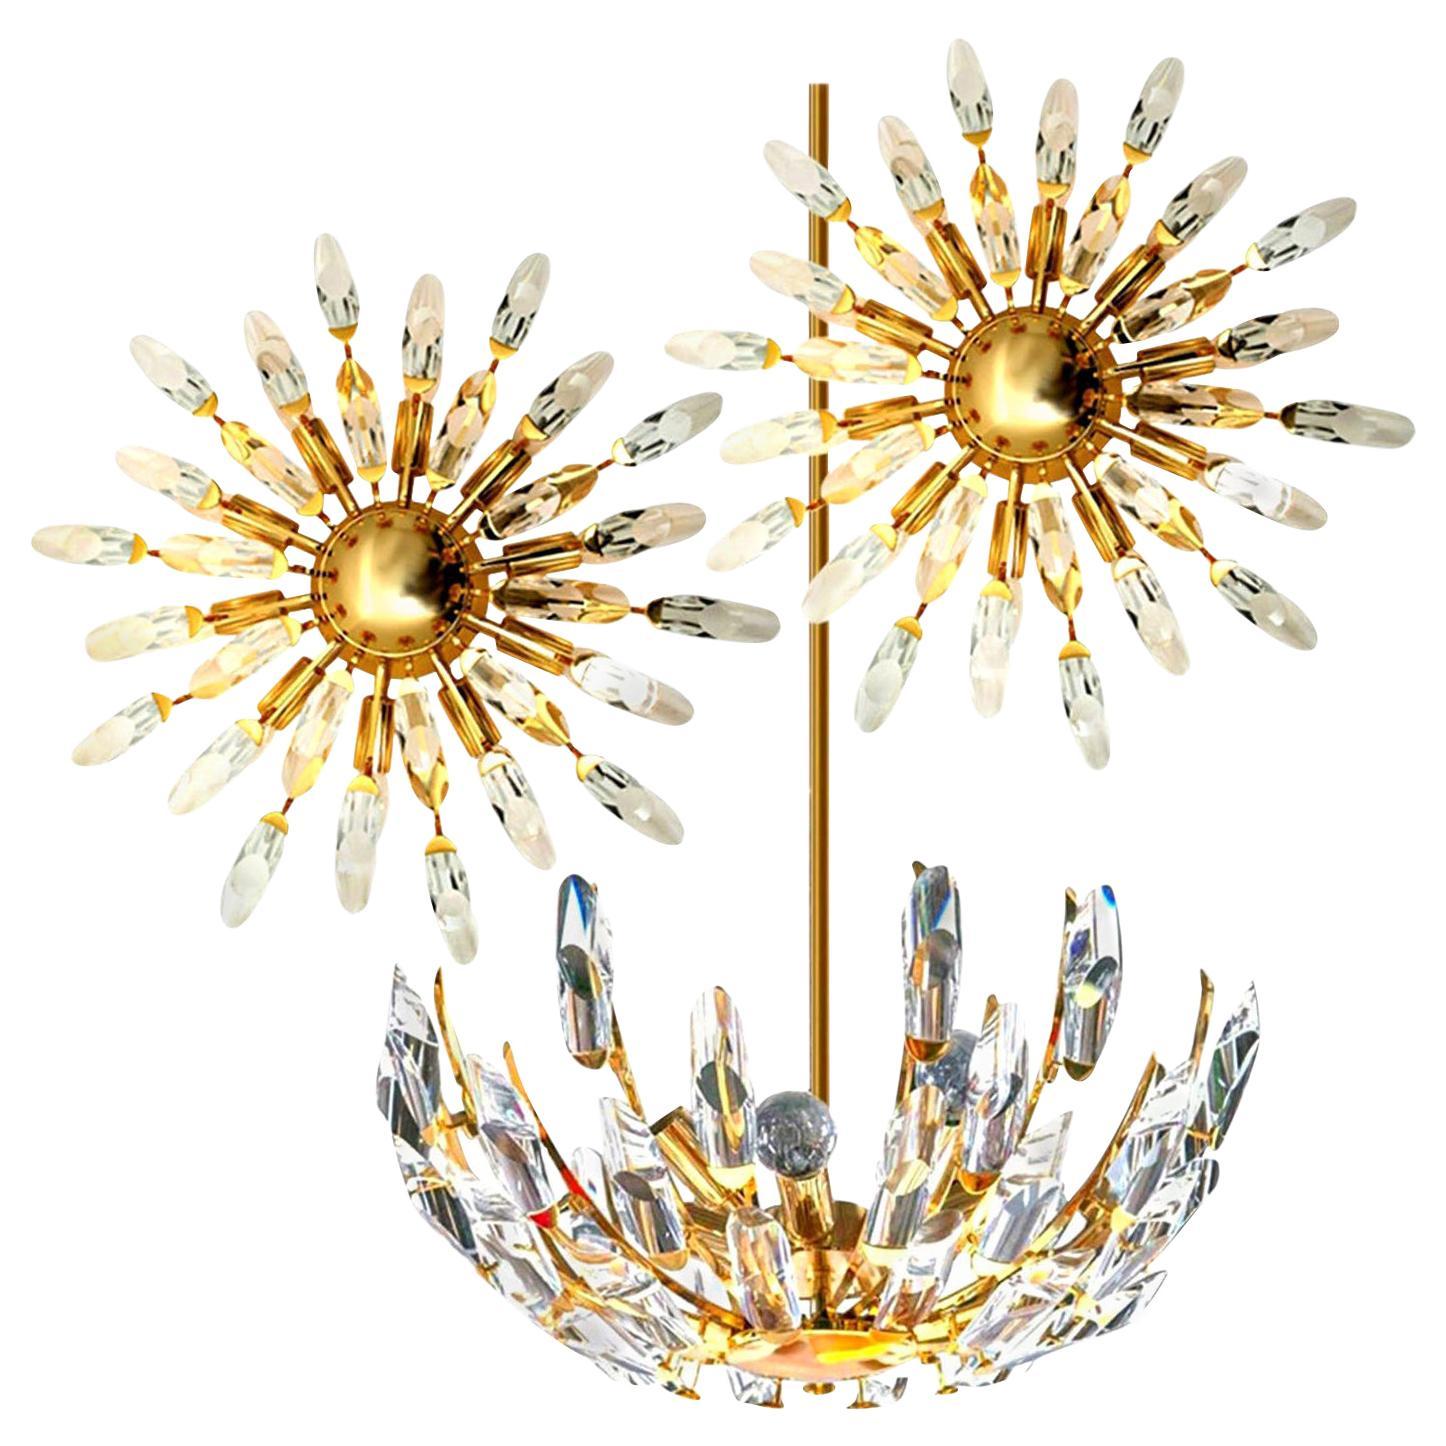 Set of Stilkronen Crystal and Gilded Brass Italian Light Fixtures, Stilkronen